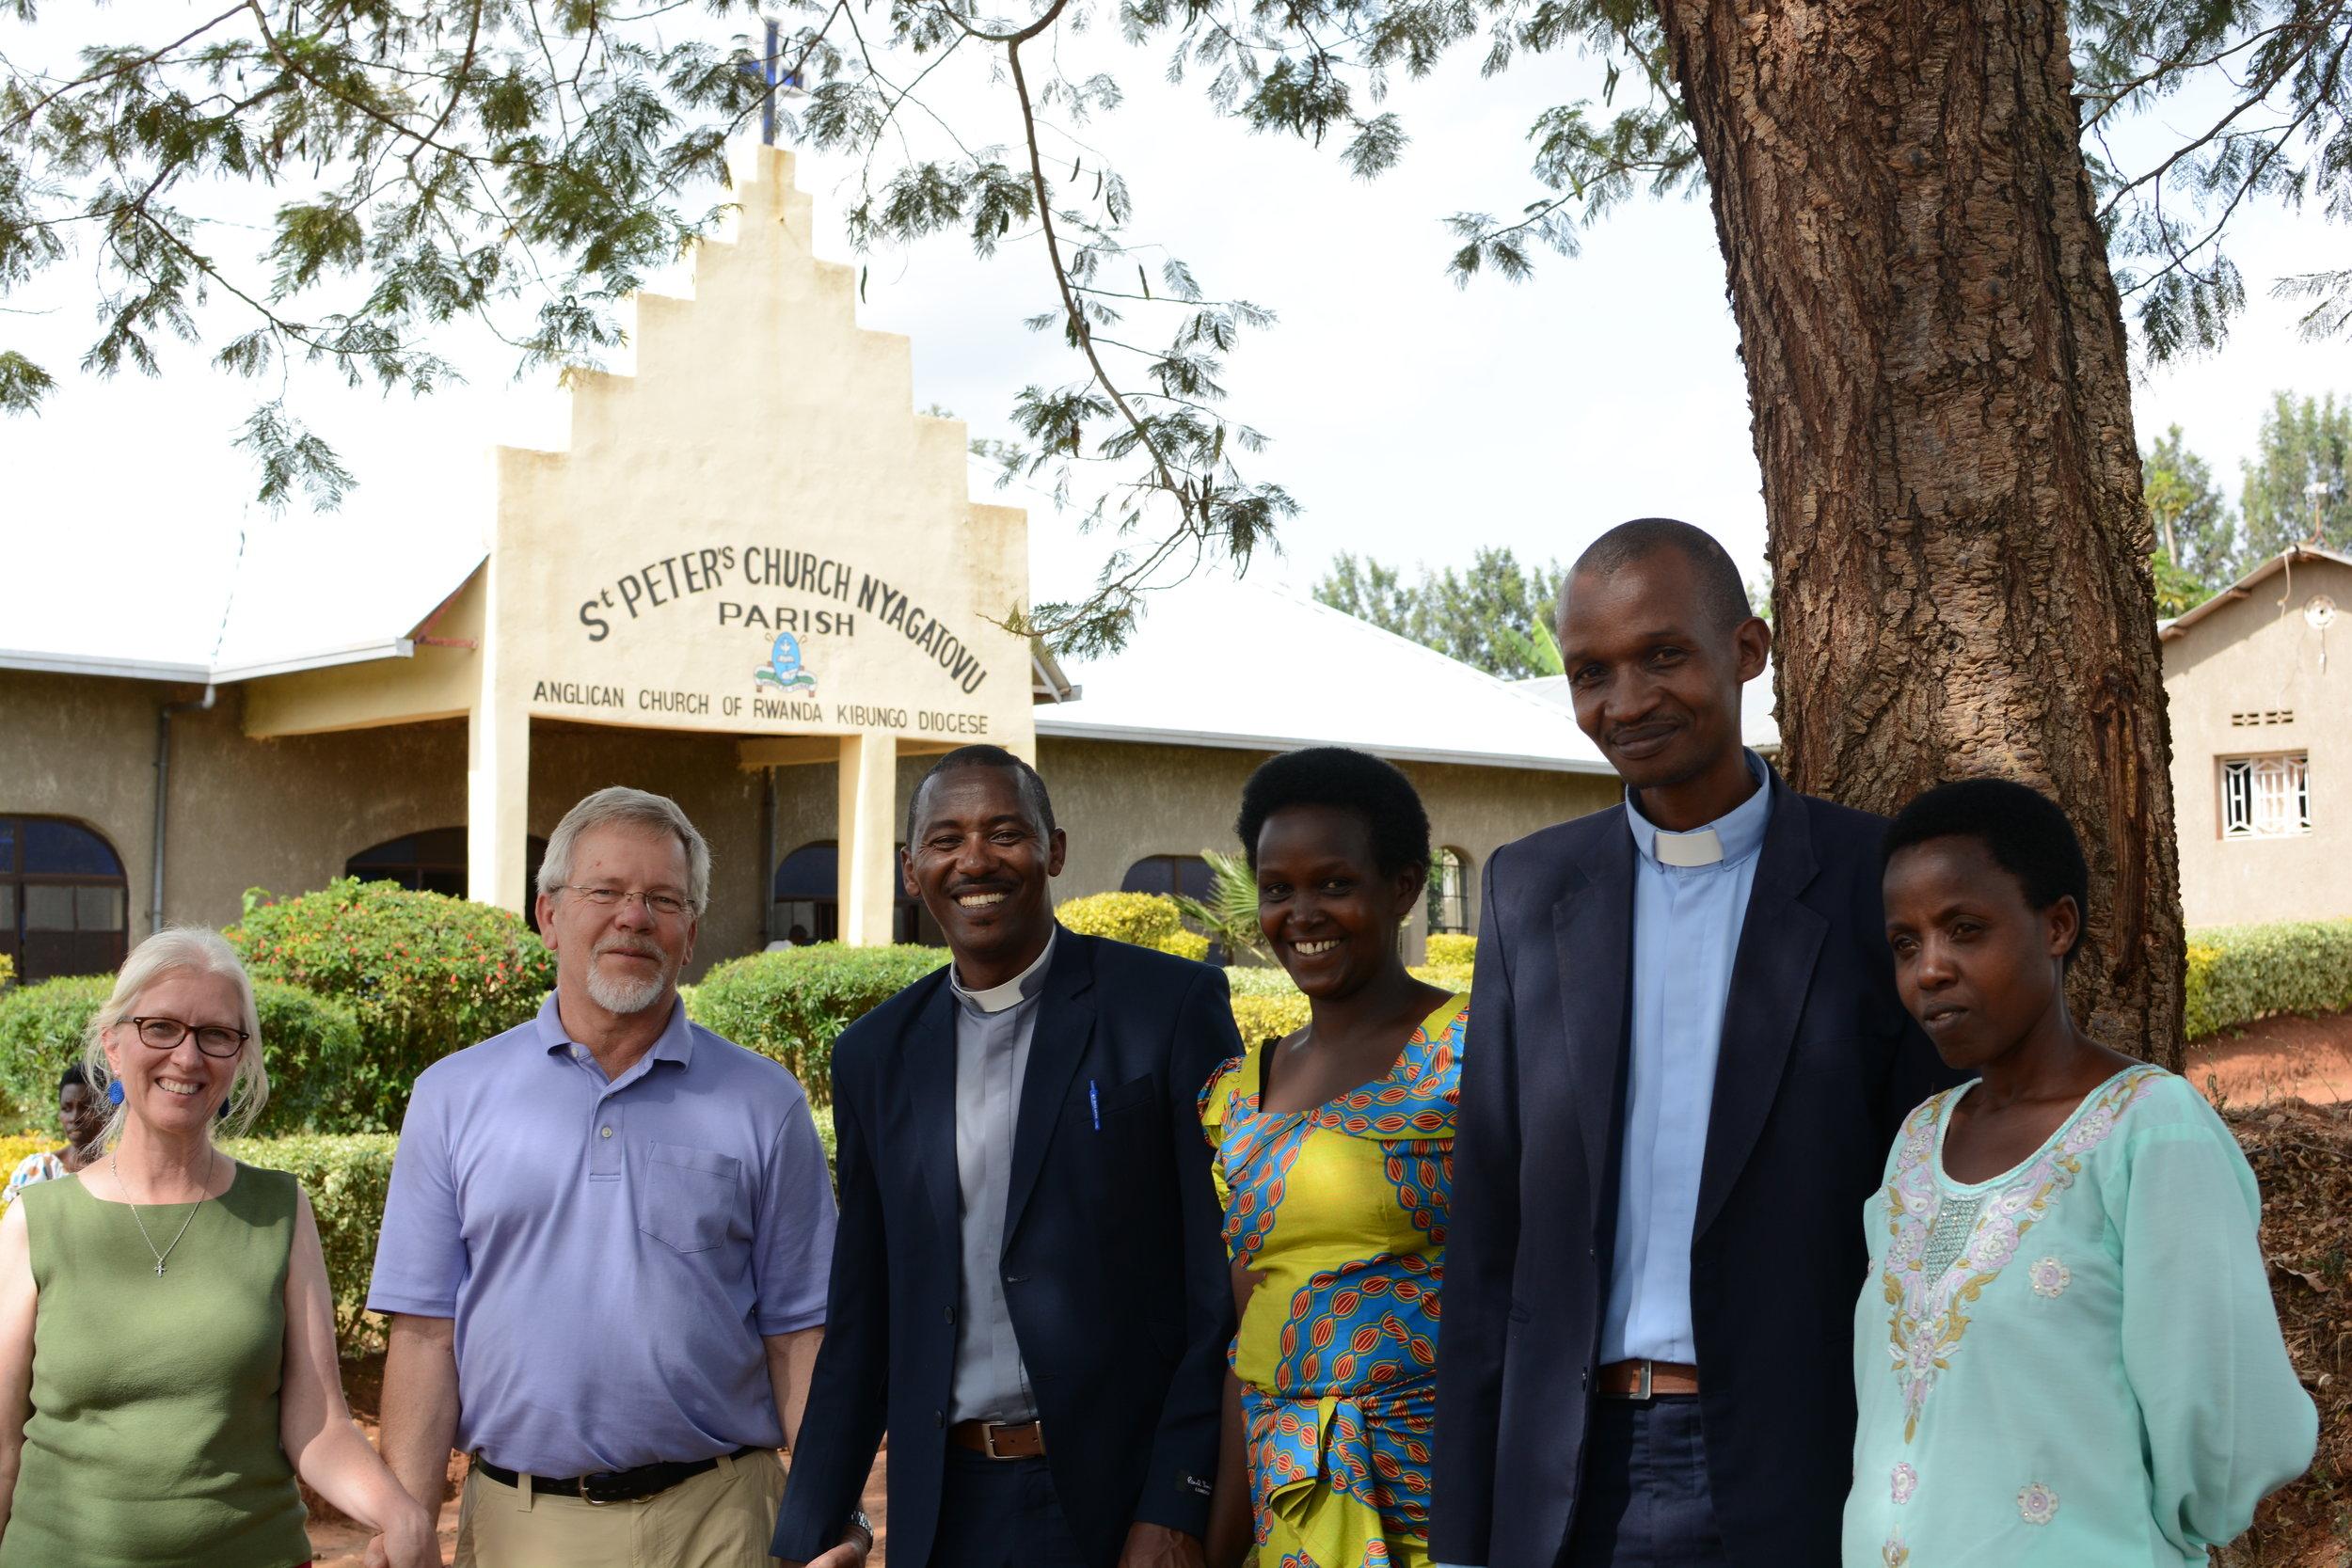 Terri & Steve Moon, Pastor Nathan & Esperance, and Pastor Xavior & Naome